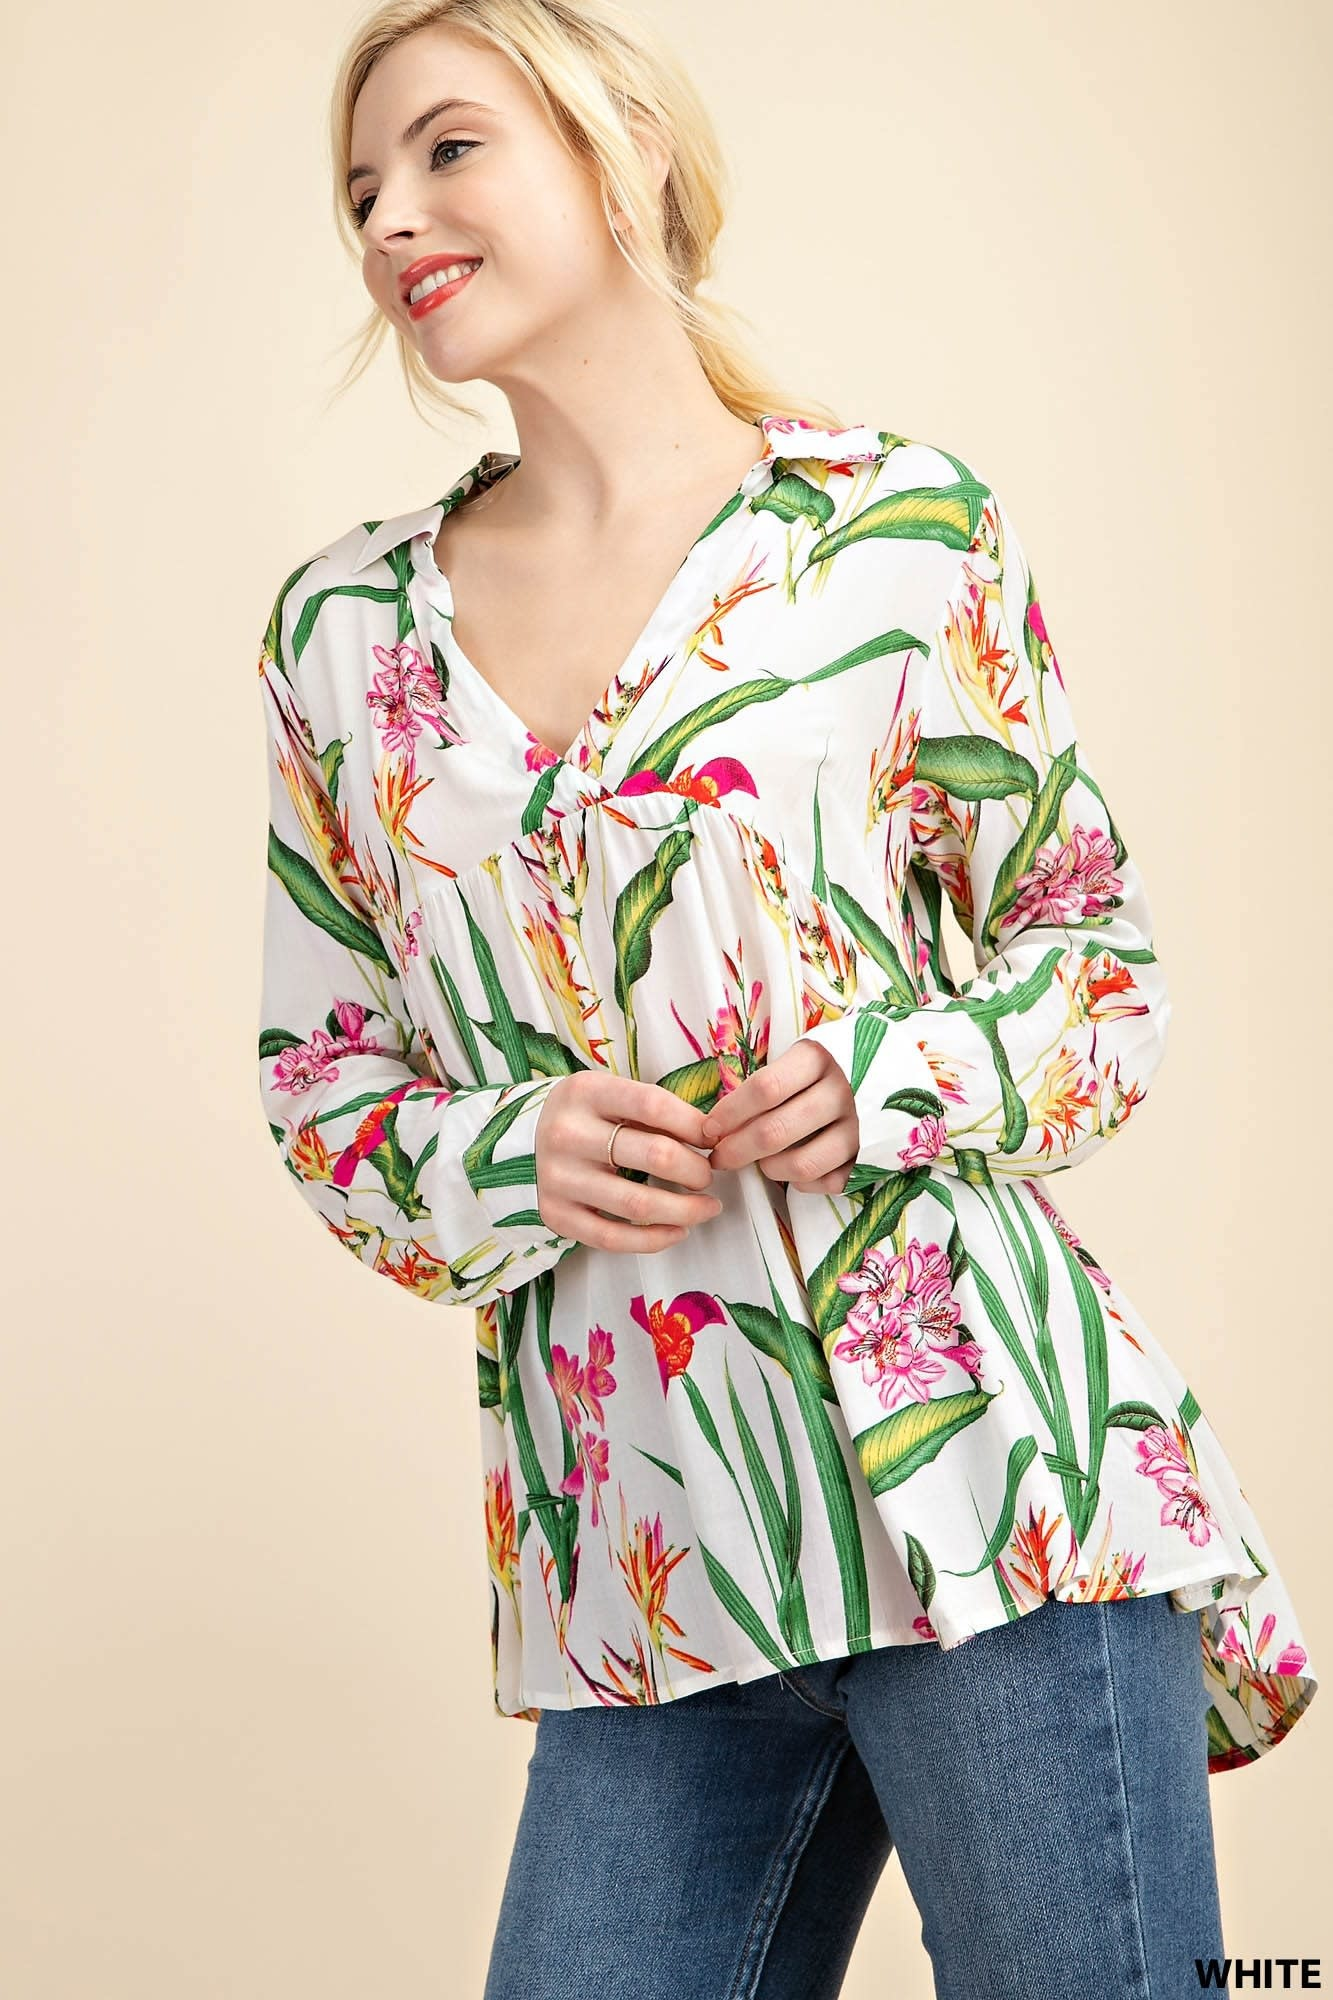 Fleurish Home WHITE FLORAL CHALLI SHIRT NECK TOP *LAST CHANCE